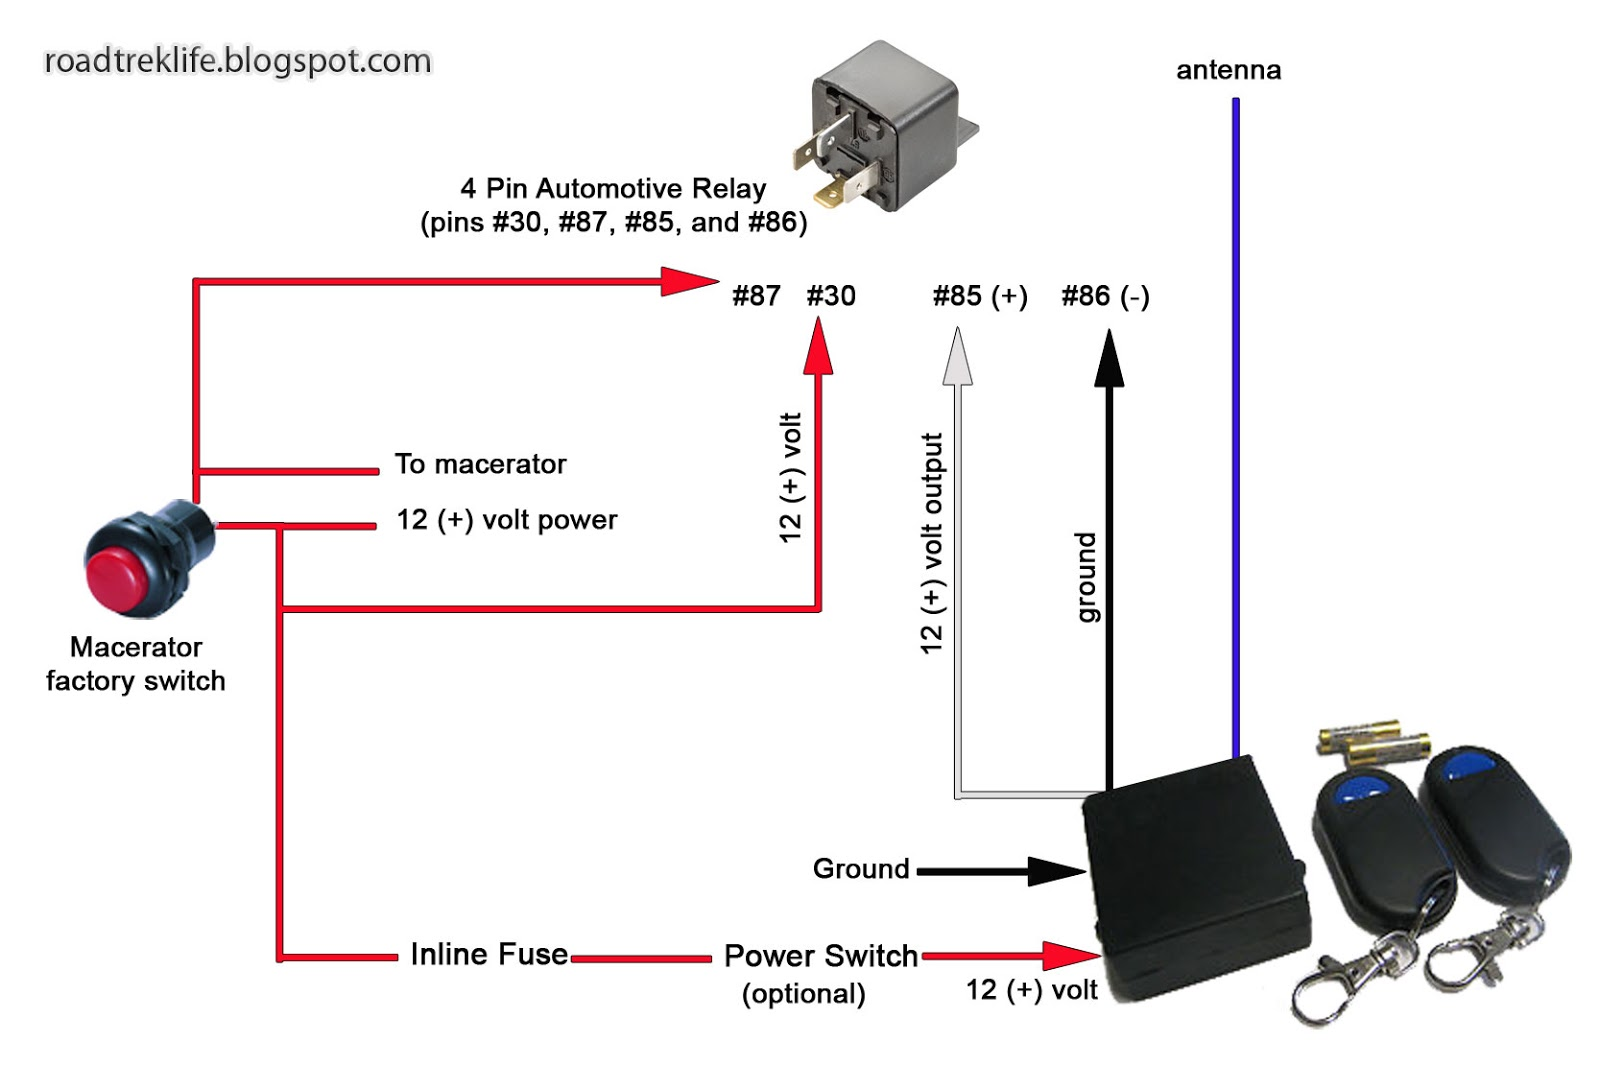 medium resolution of wiring diagram roadtrek e trek wiring diagram used wiring diagram roadtrek e trek